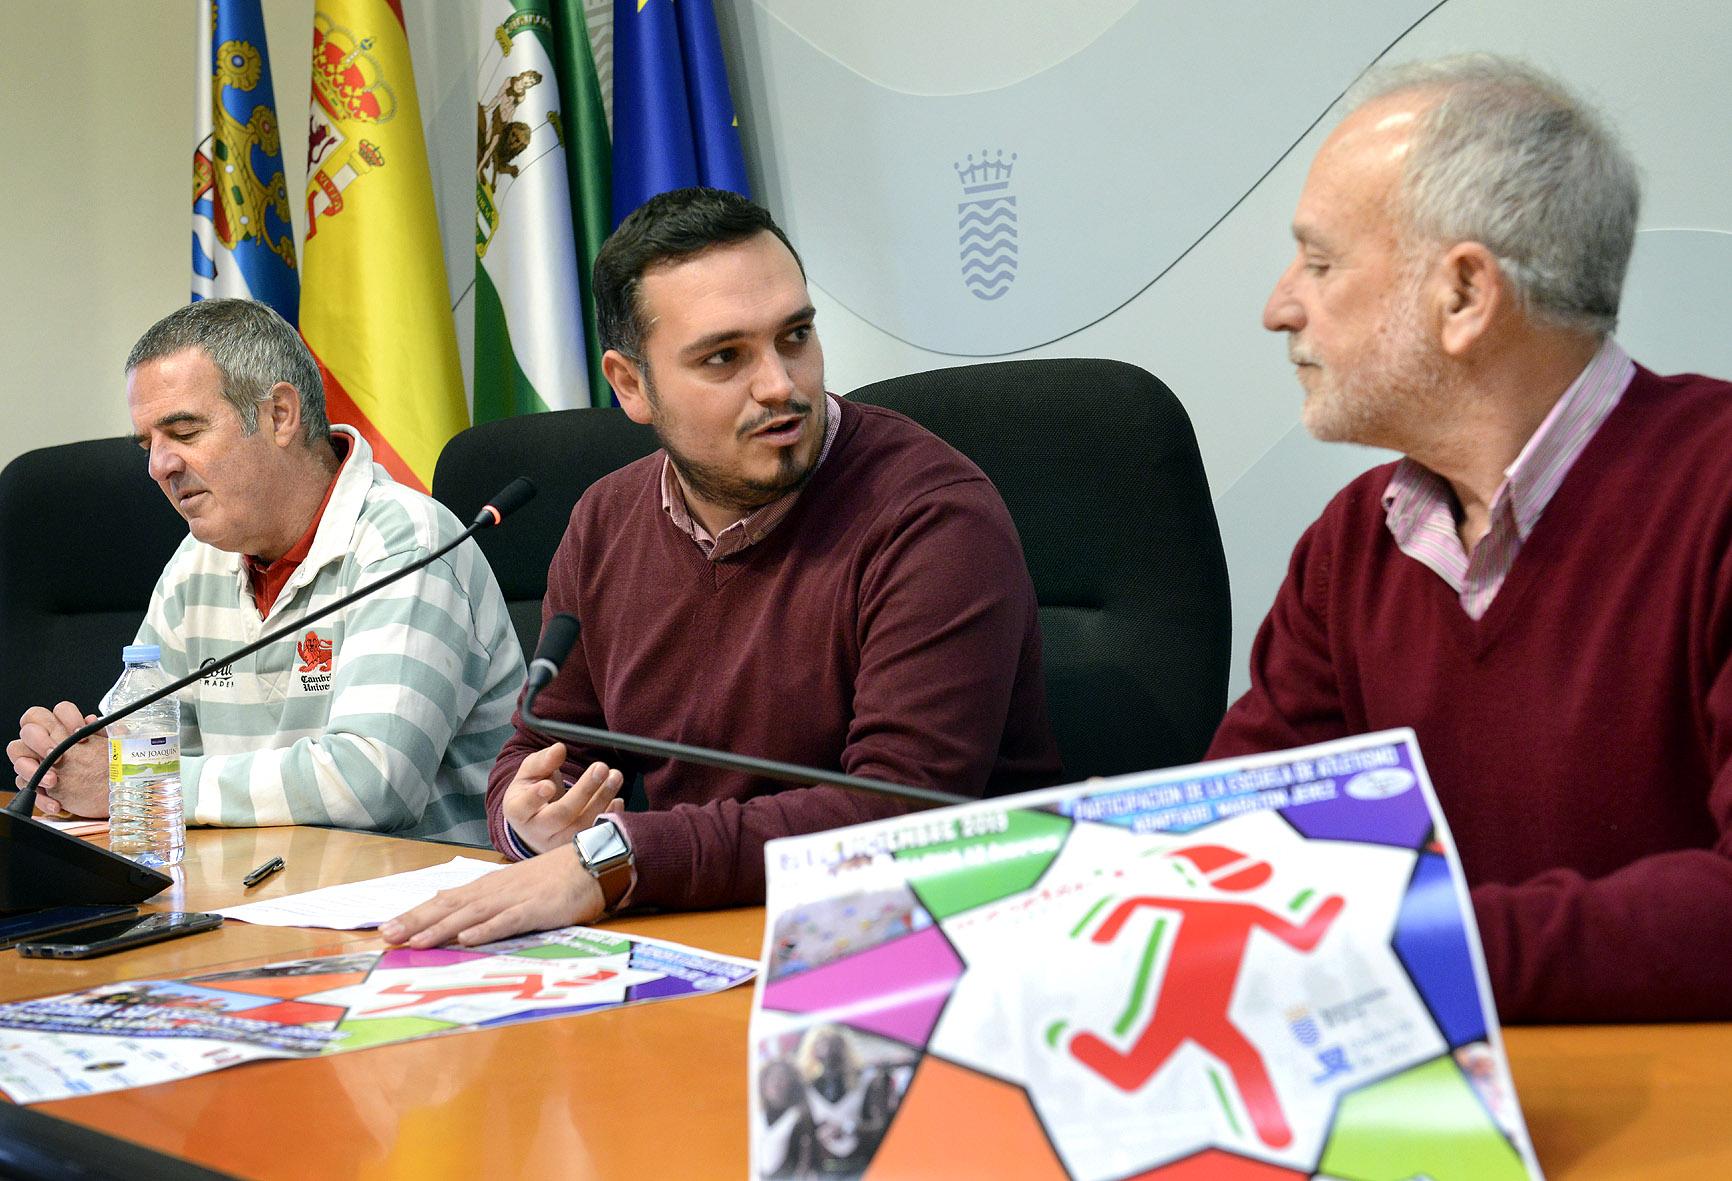 Presentación San Silvestre. Archivo. 2019